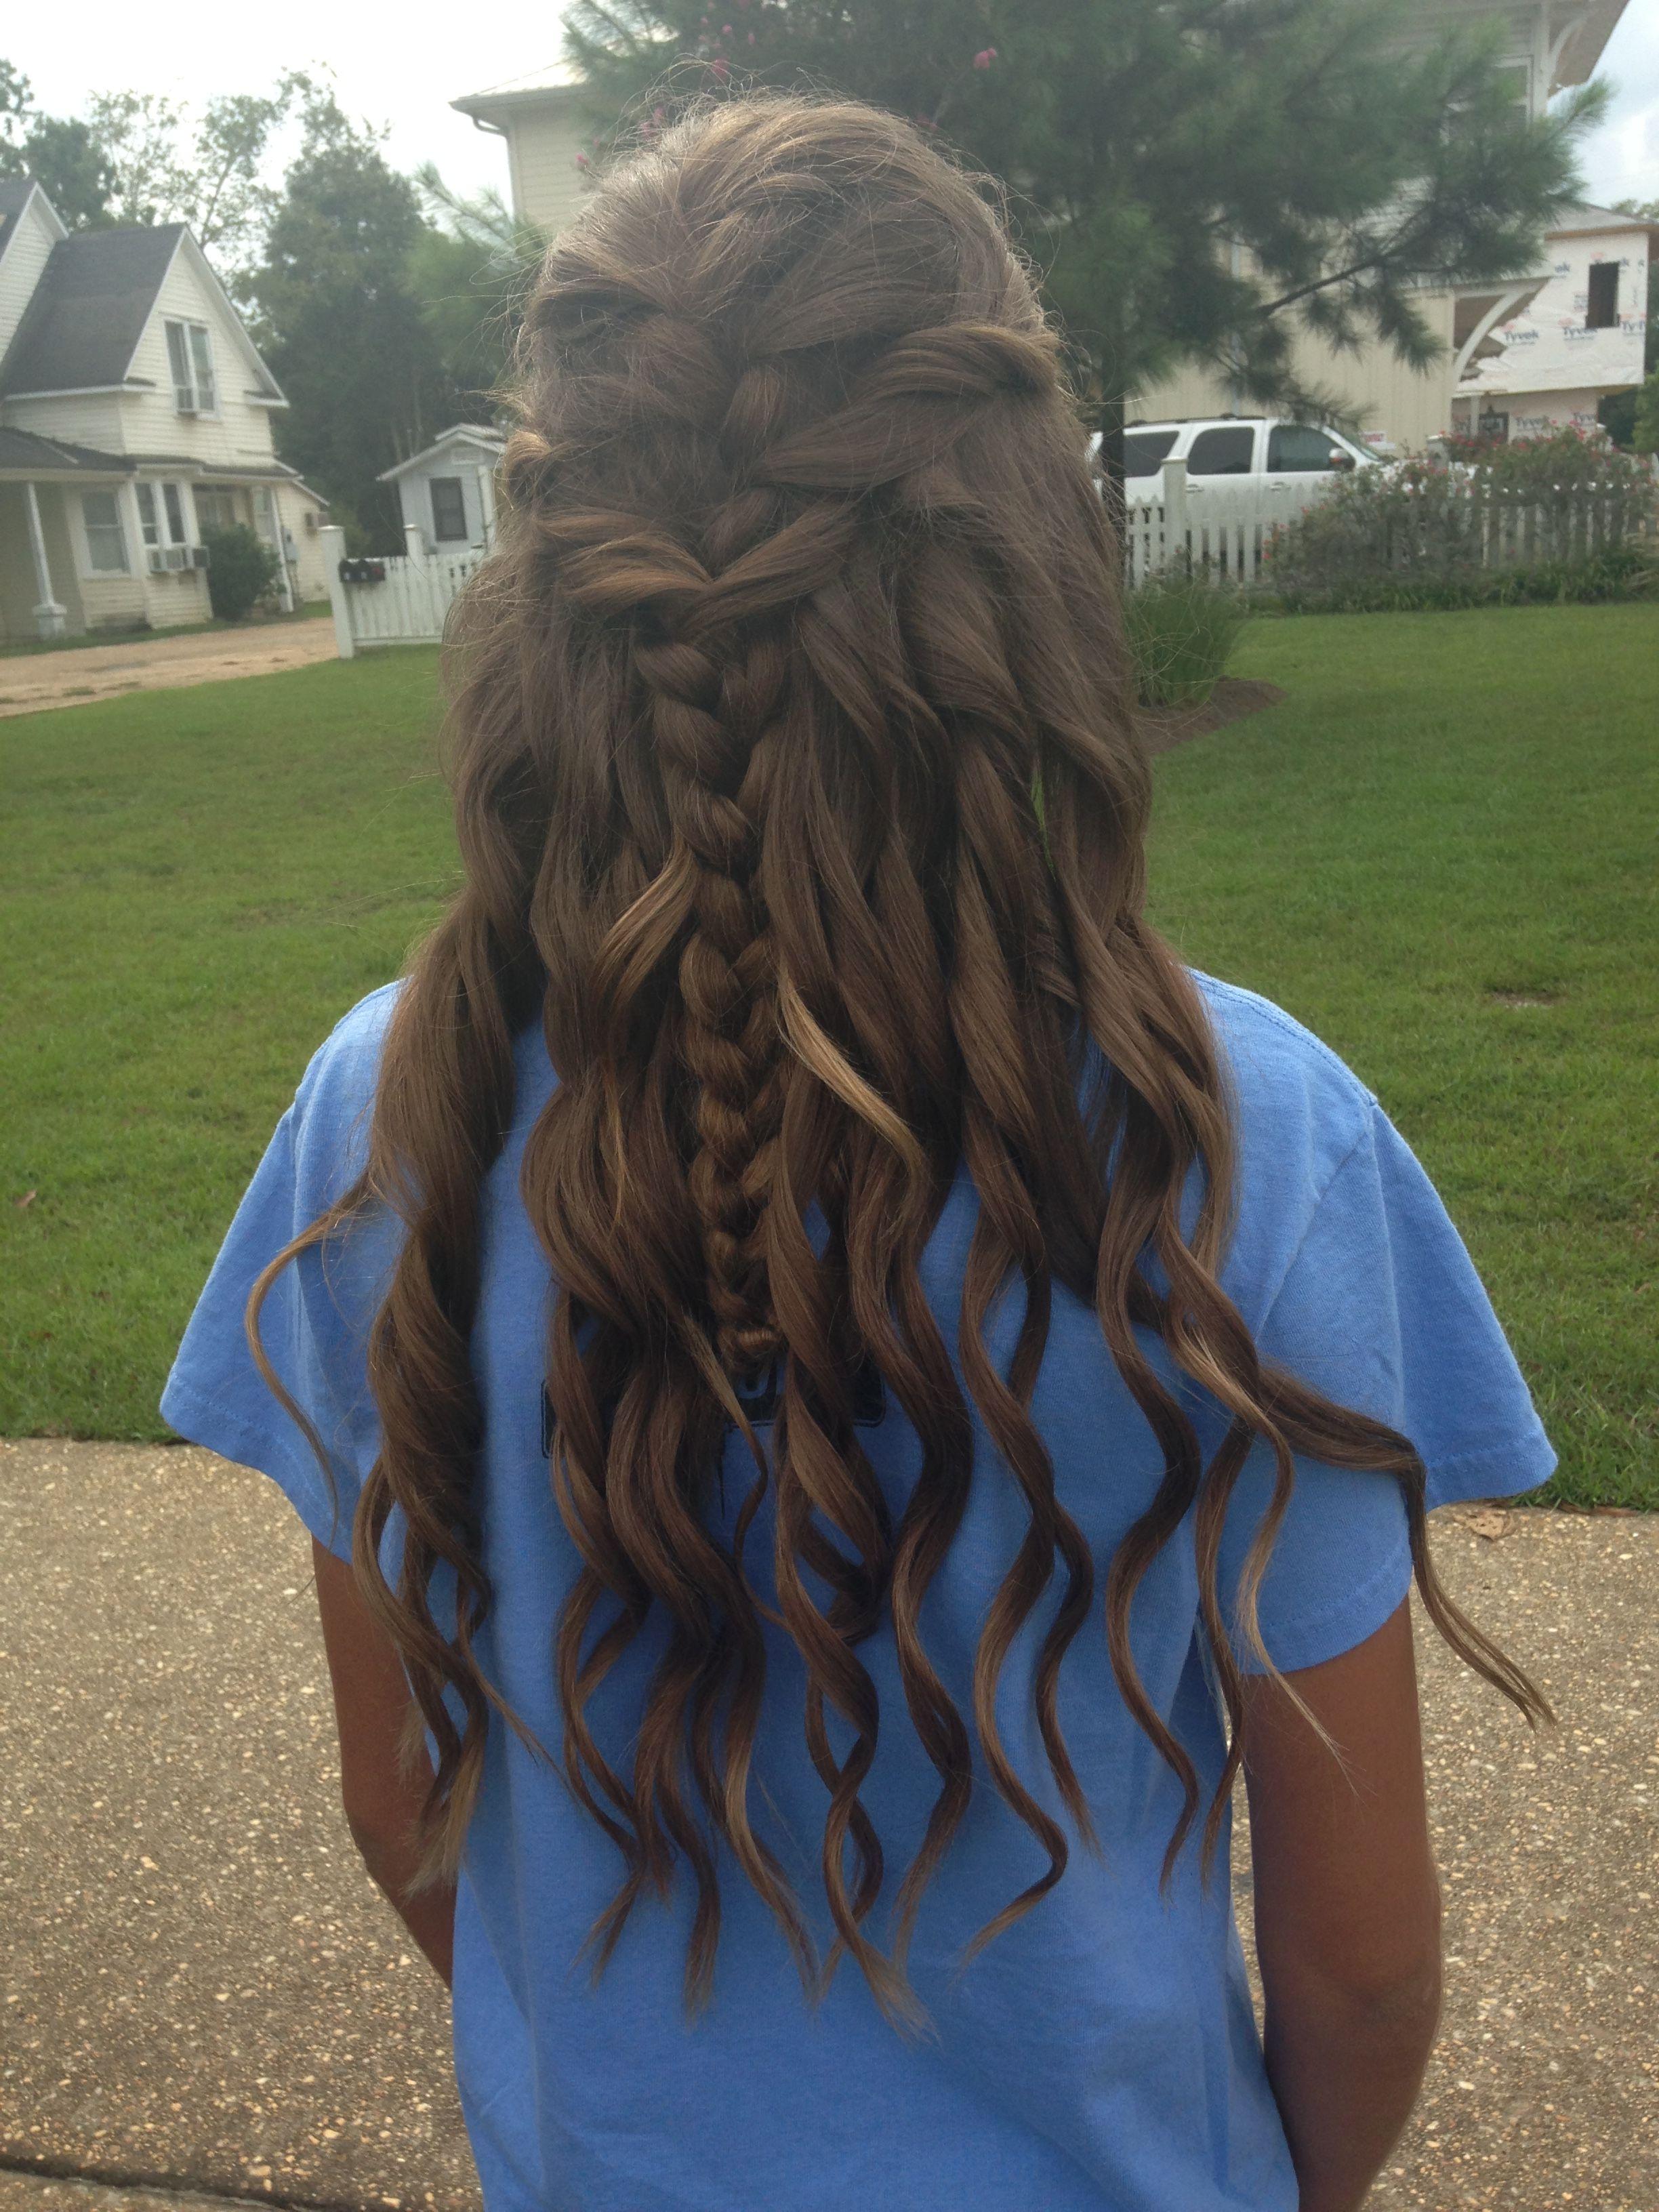 Homecoming hairstyles half up half down long hair hairstyles